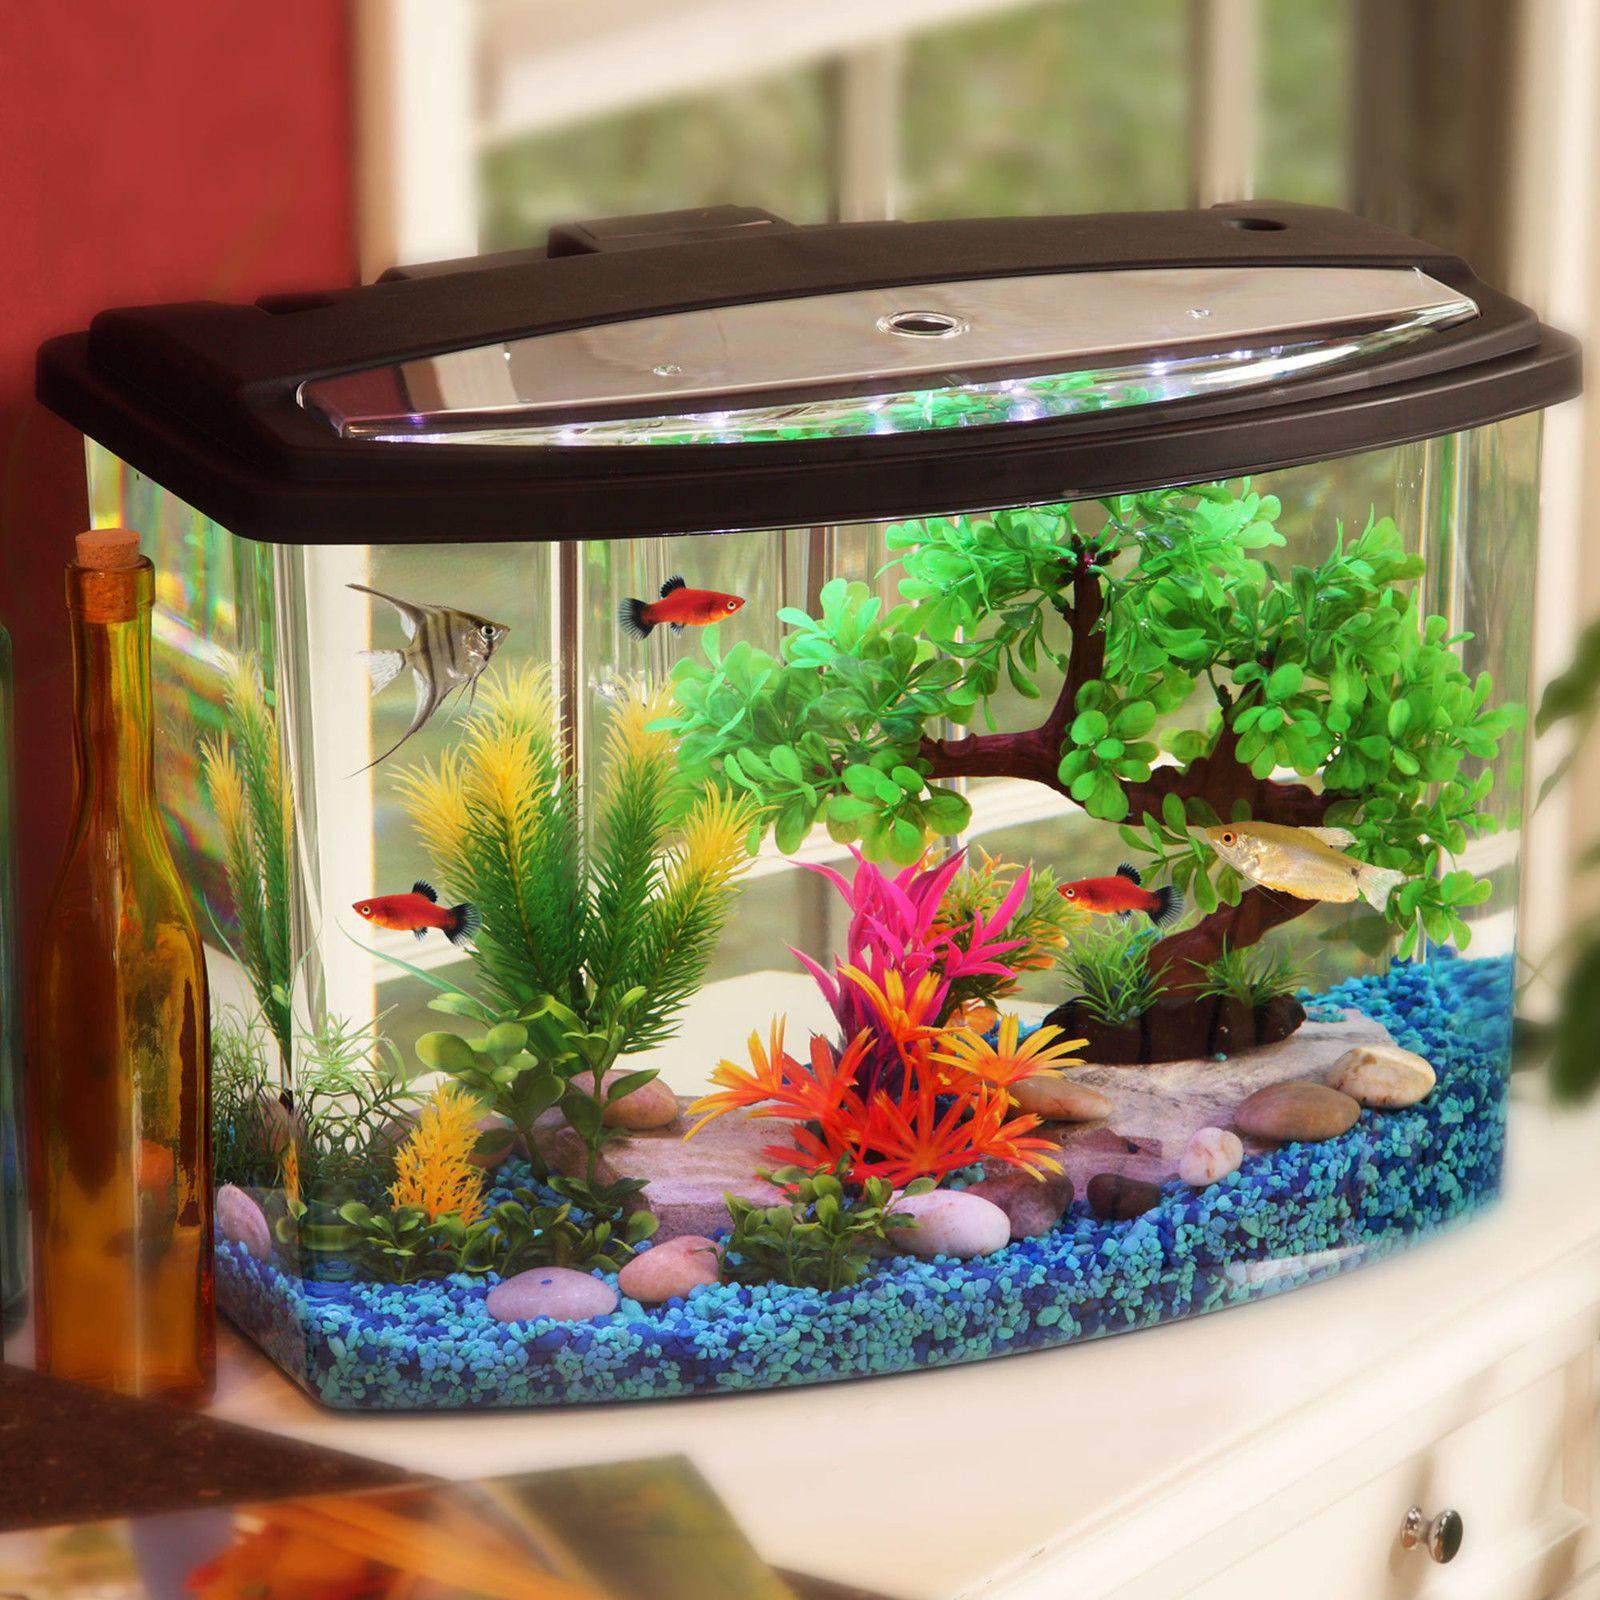 Hawkeye NEW! Aquarium 7 Gallon Tank Fish Kit LED Light Colors Power ...